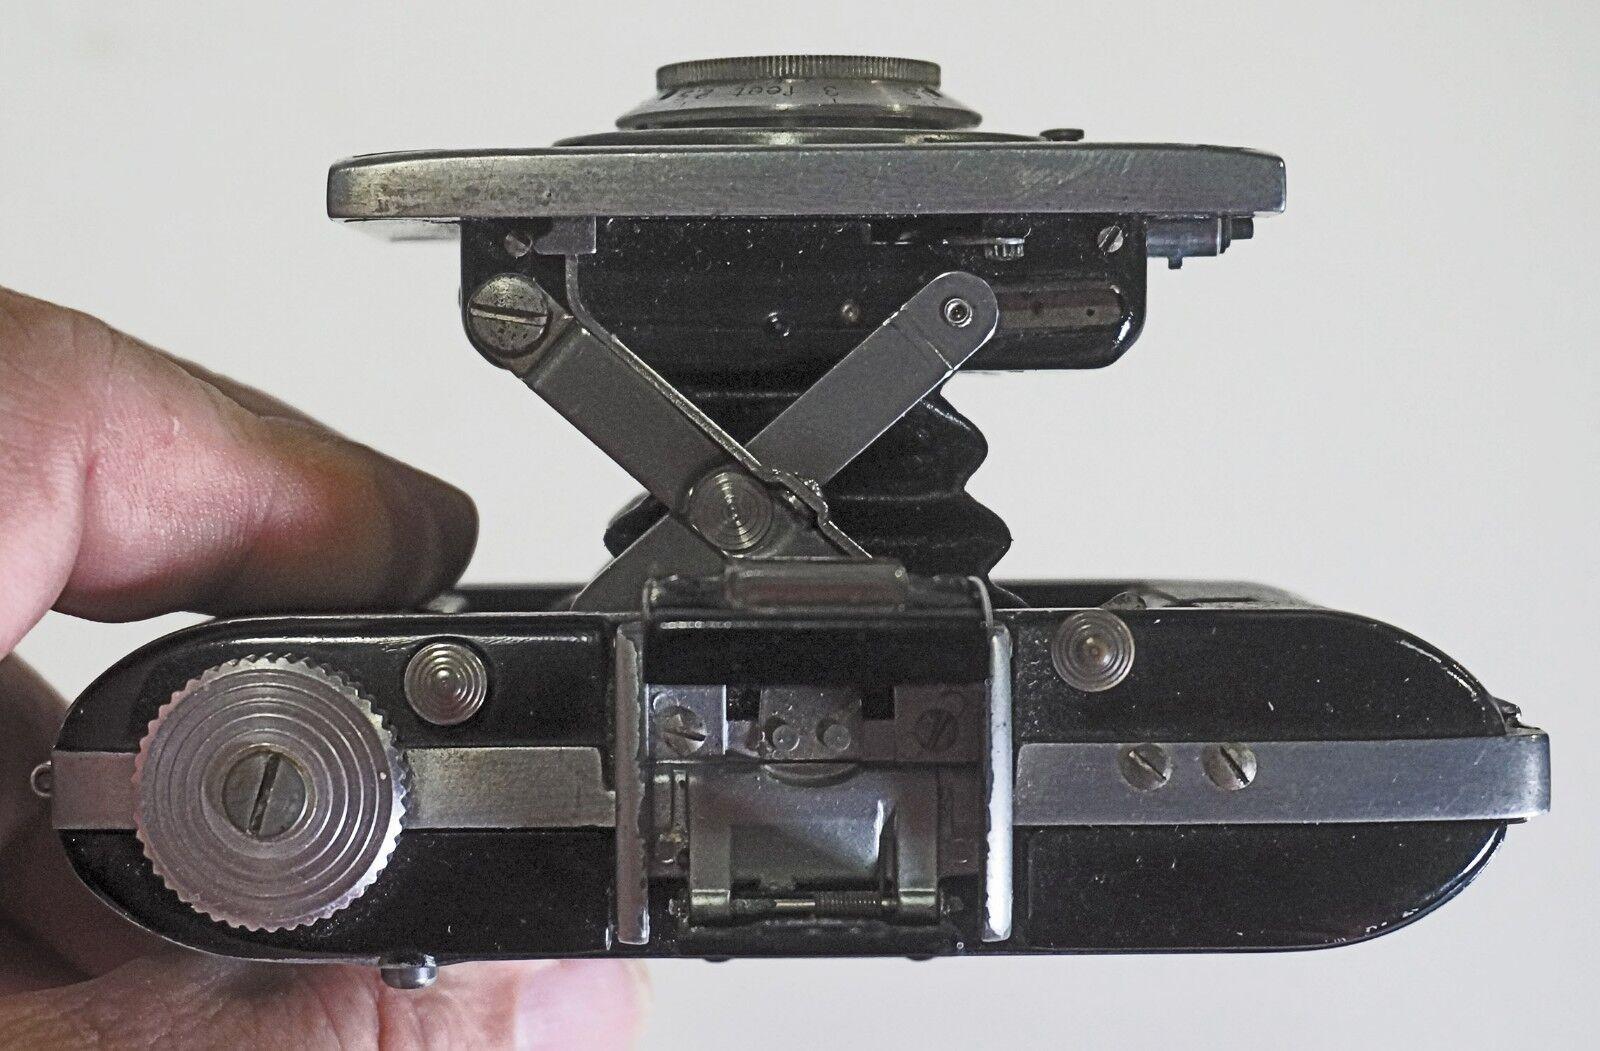 Kodak Flash Bantam, Miniature Folding Camera From 1947. Working. - $50.00